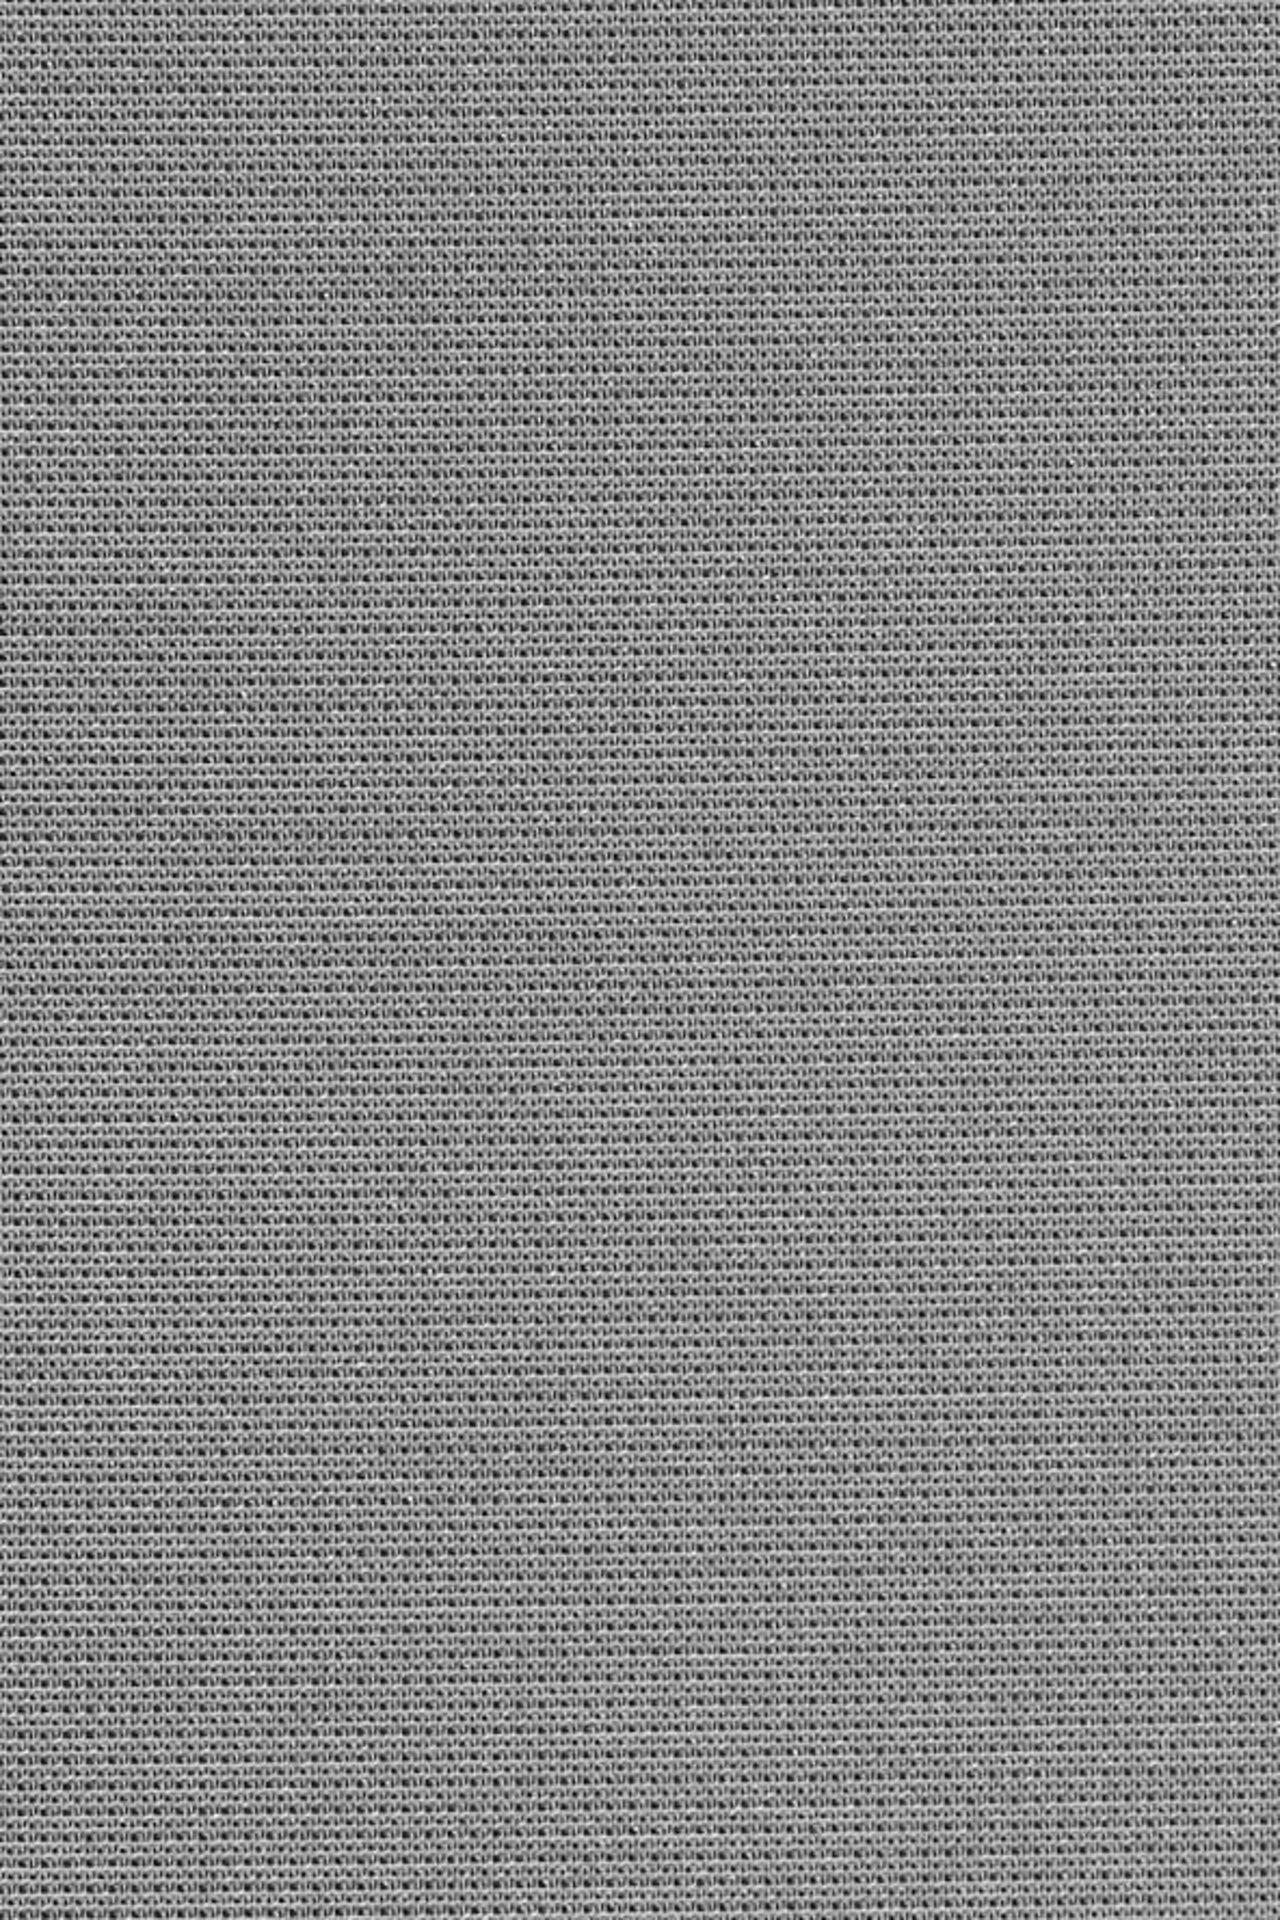 Flächenvorhang SAROS-60 Neutex Textil 60 x 245 cm